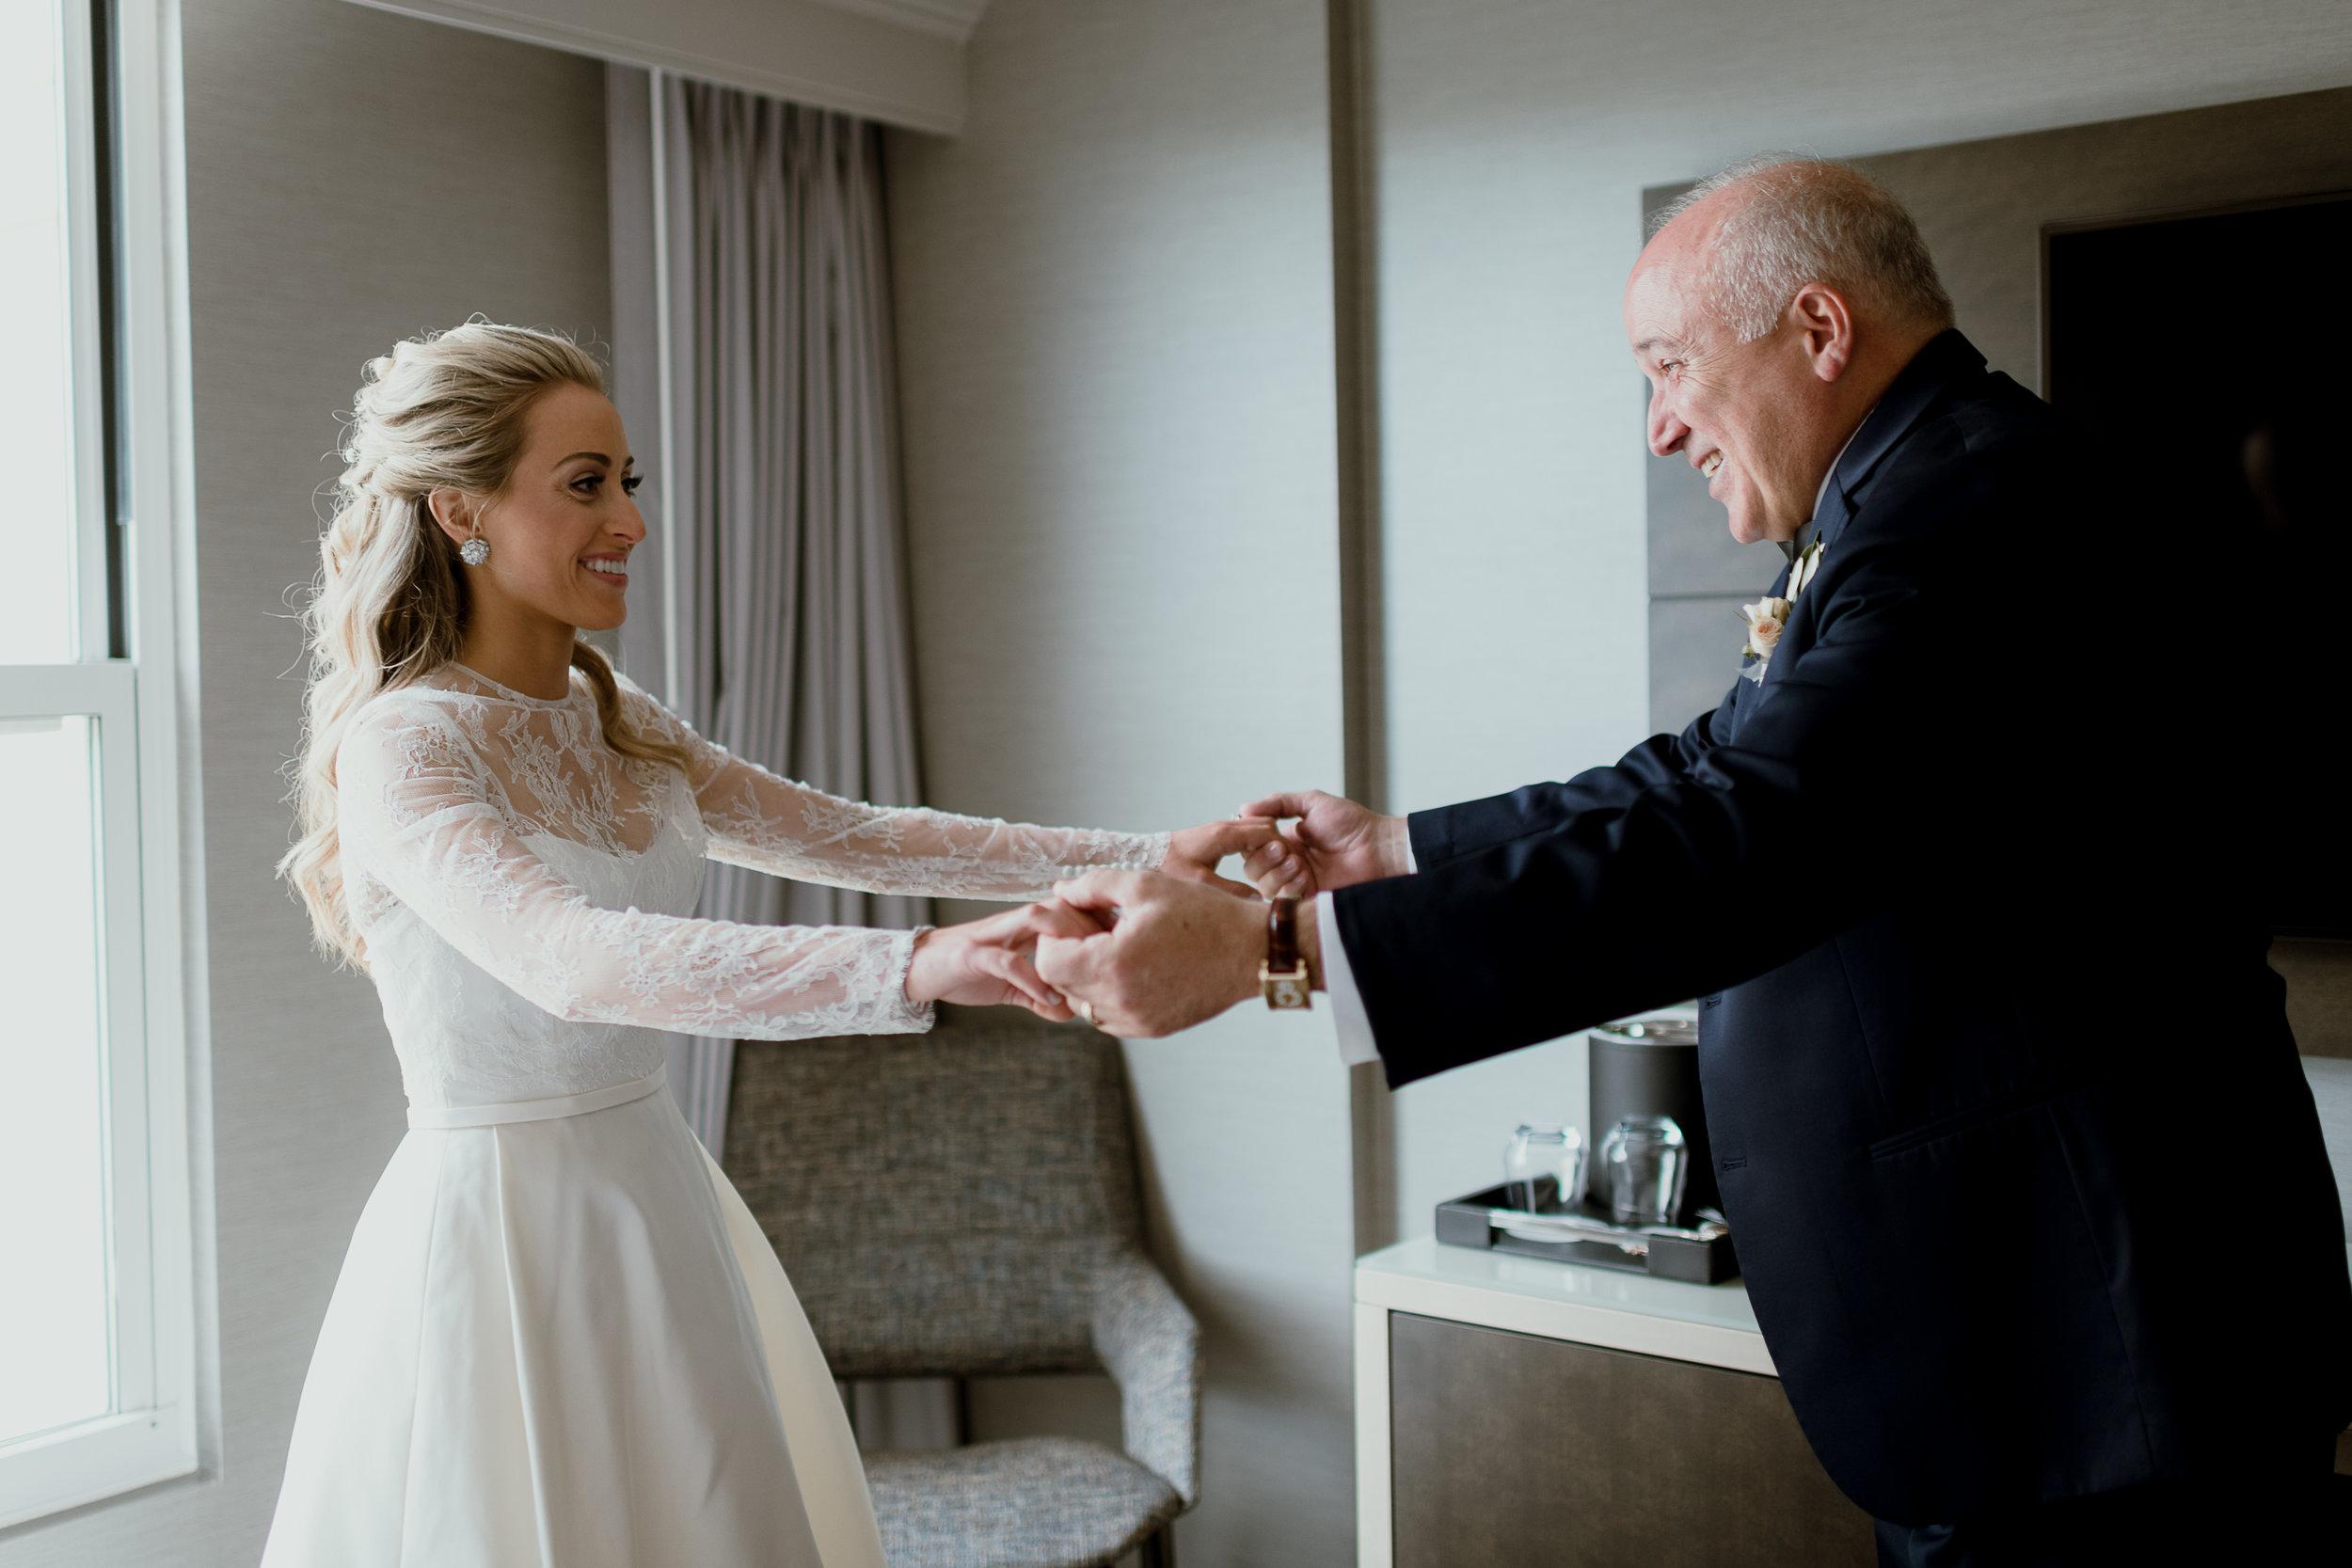 Green & White Wedding Jonathon Edwards Vineyard Wedding0-3.jpg